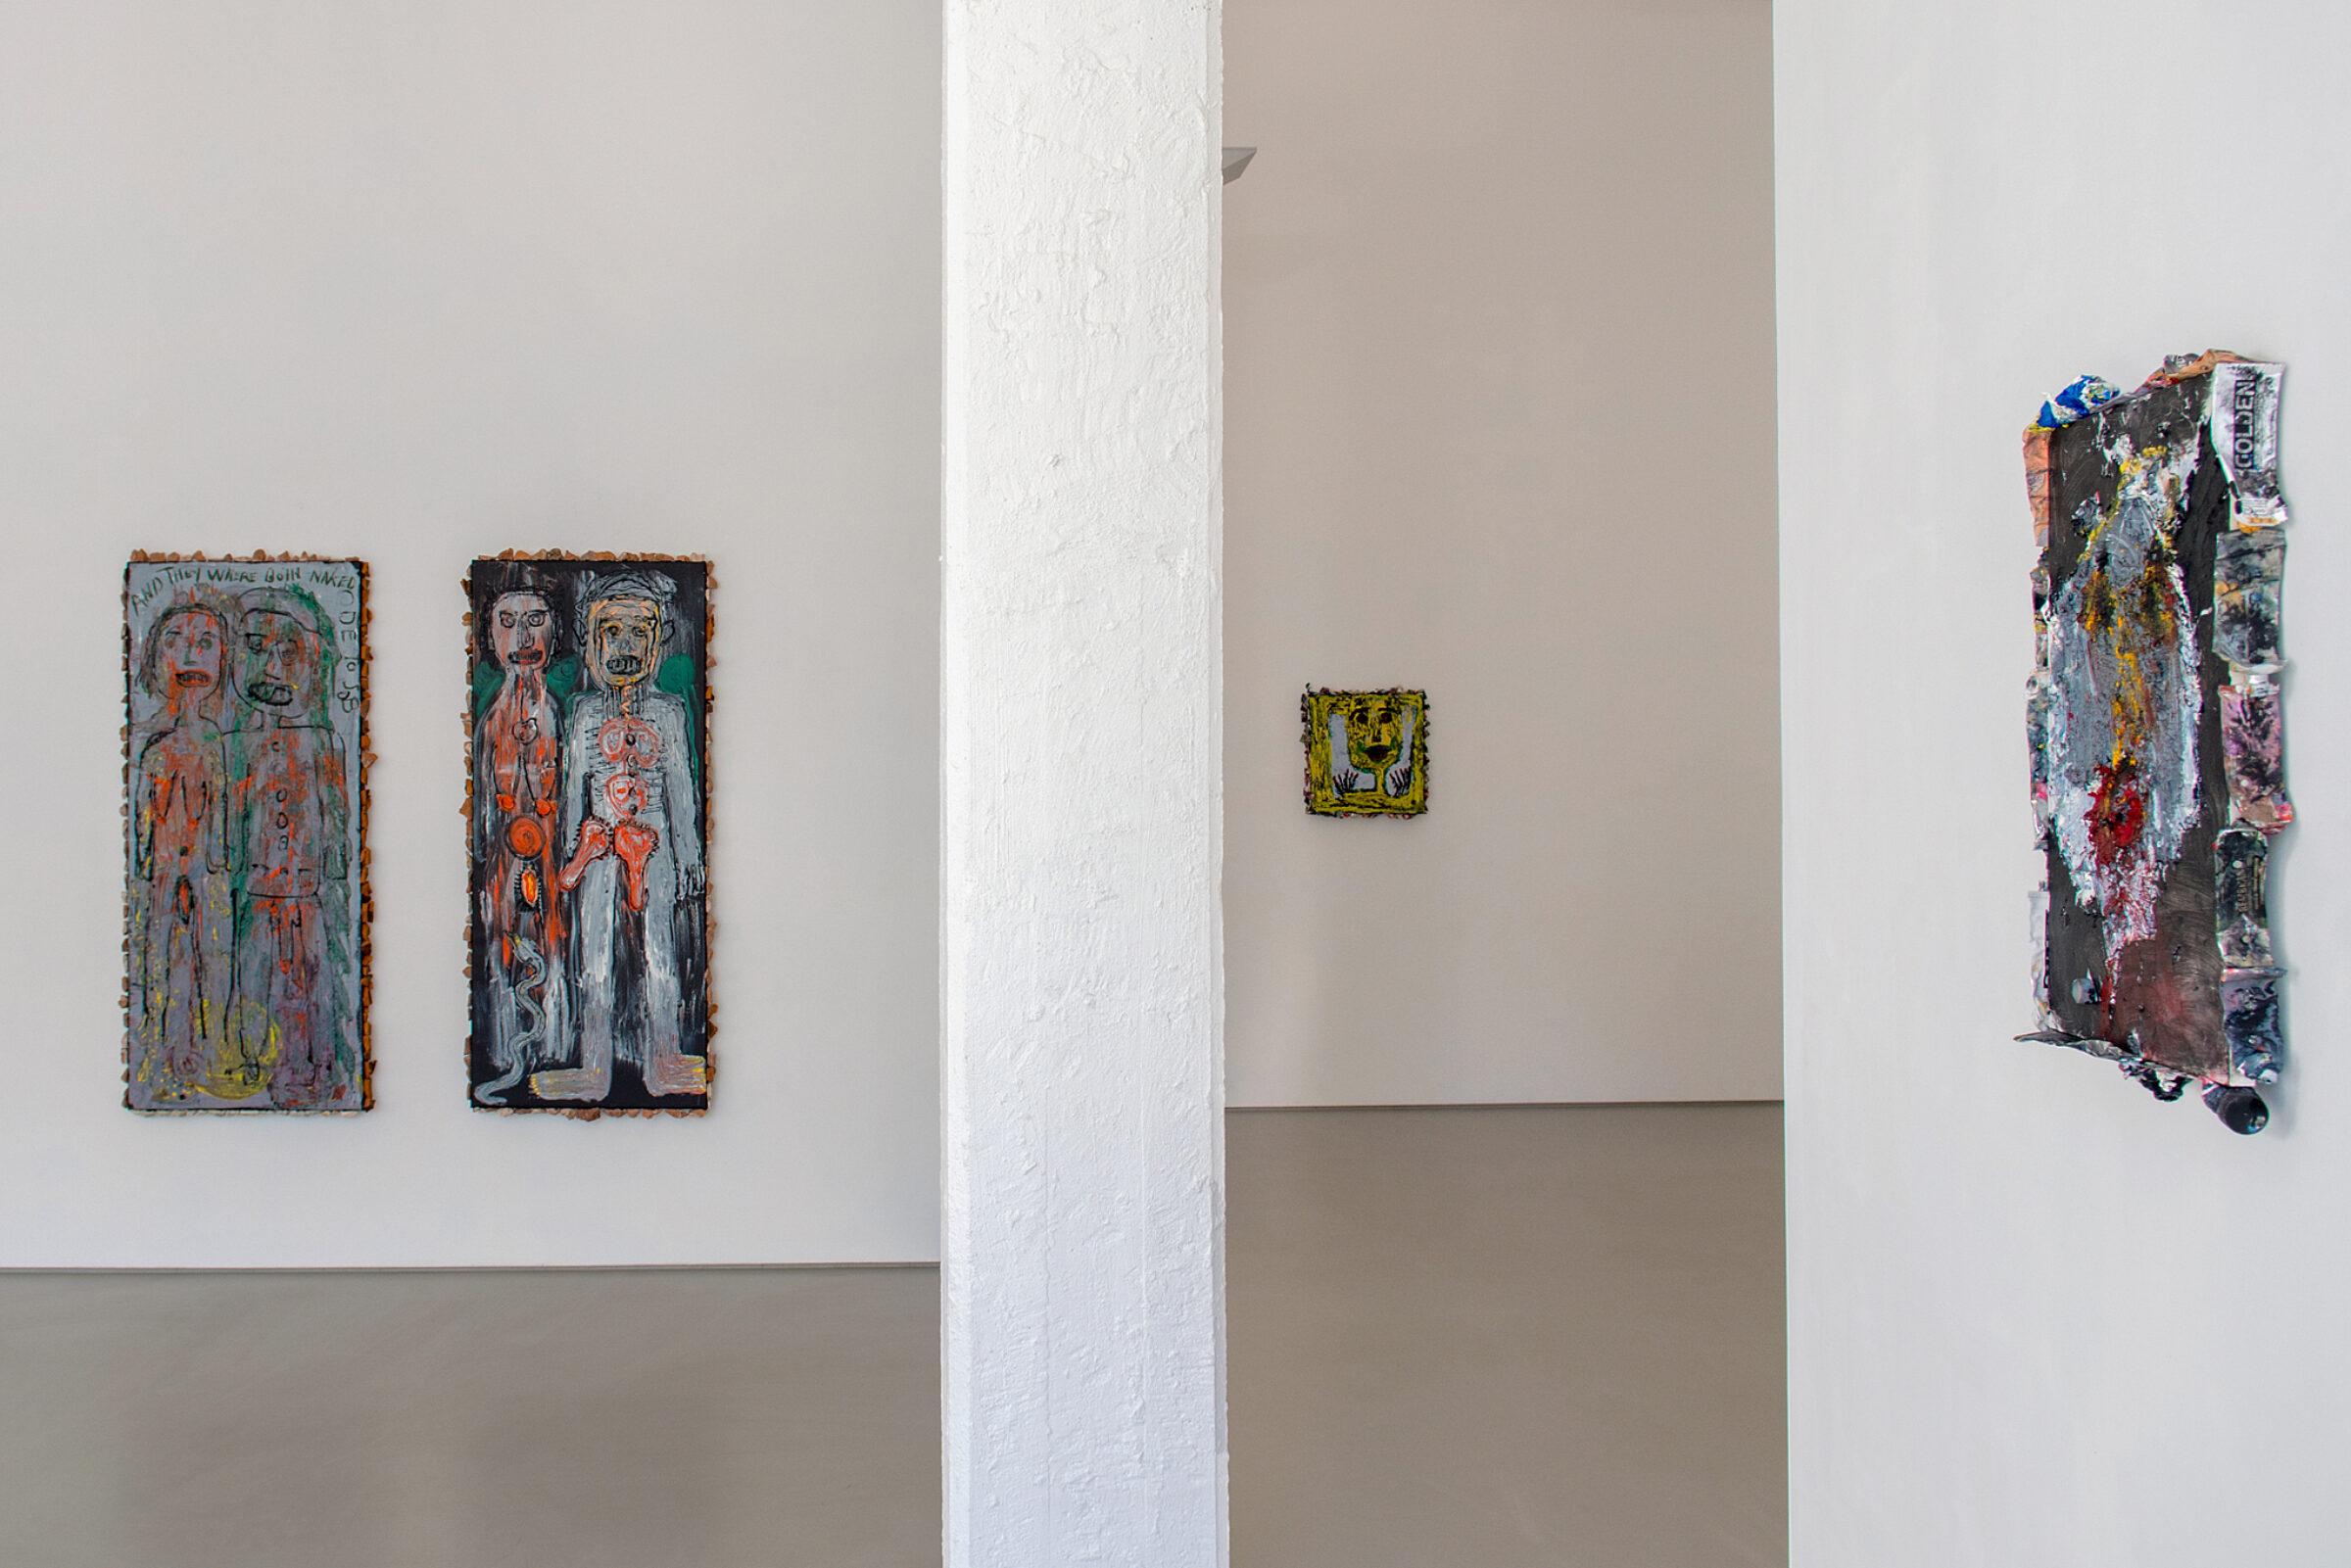 Eli-Content-Galerie-Onrust-works_2019_mensch_01.jpg